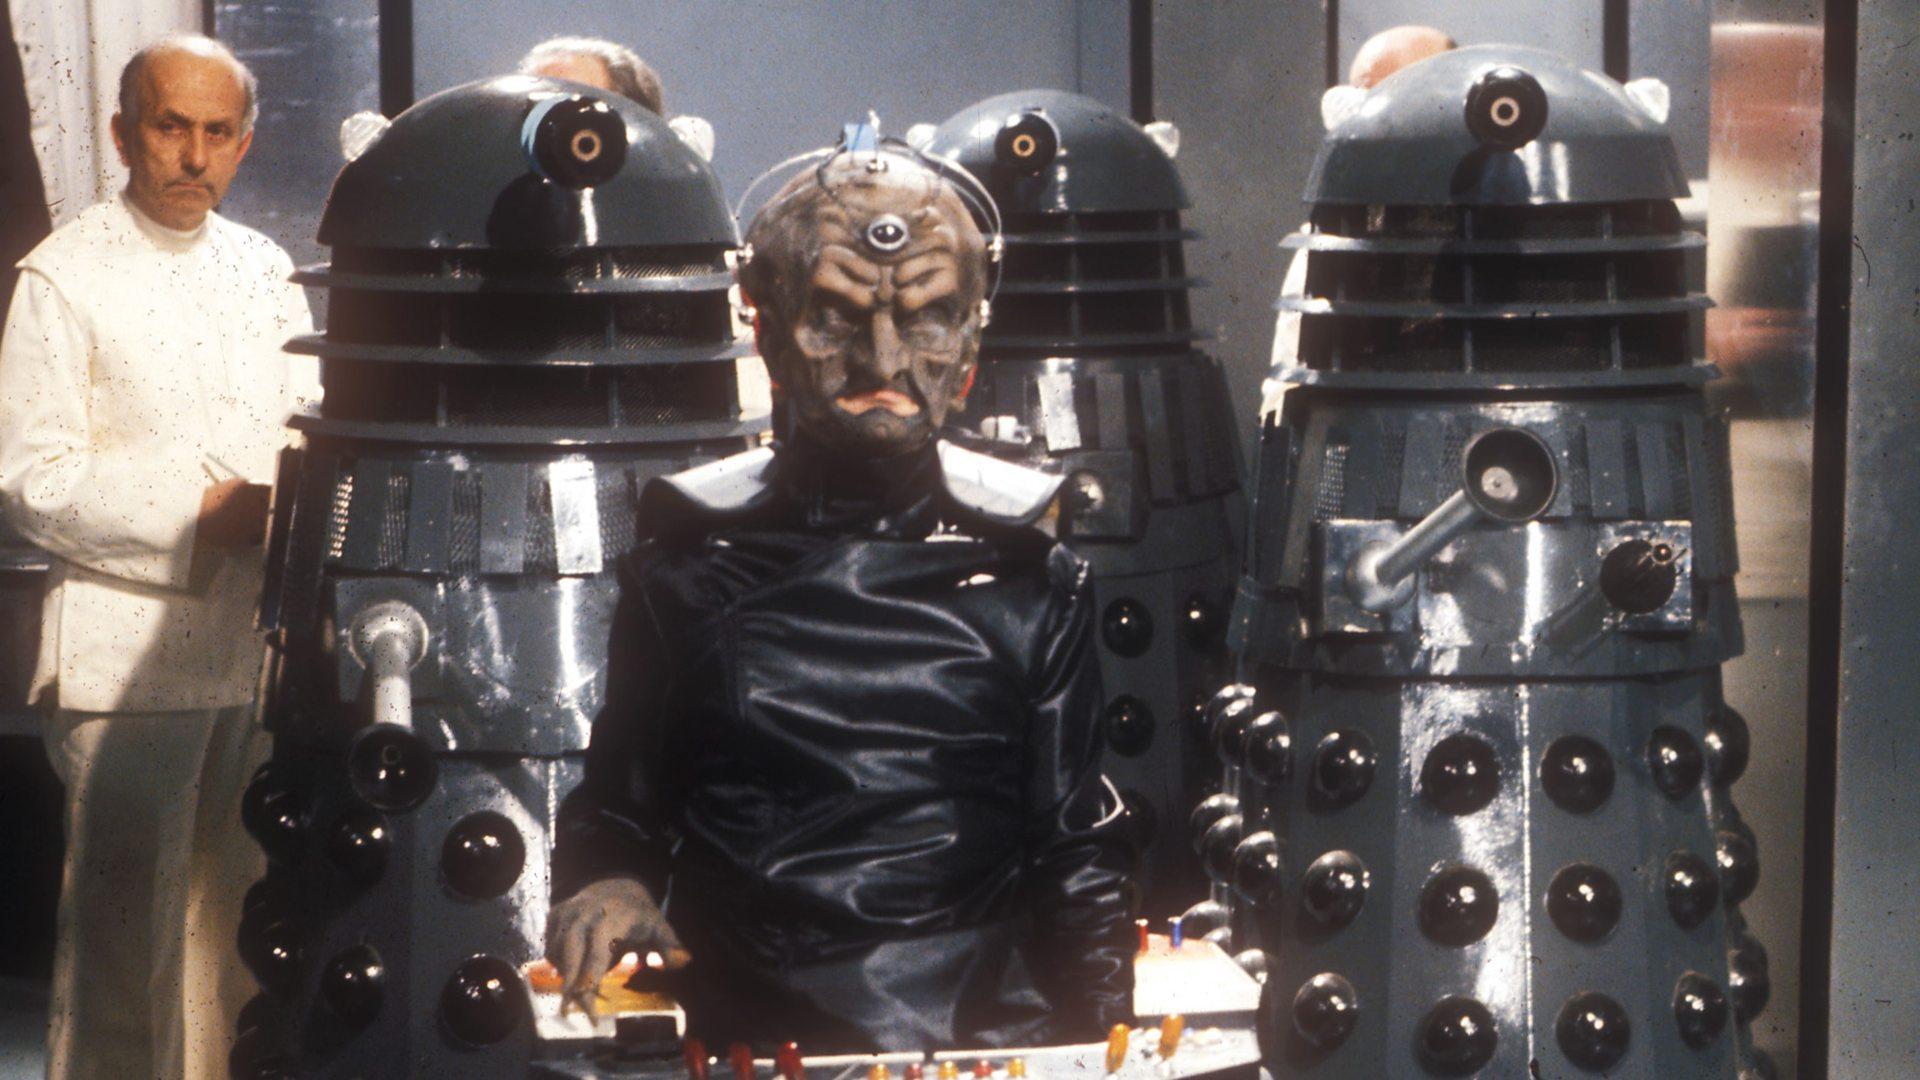 Genesis of the Daleks. Credit: BBC